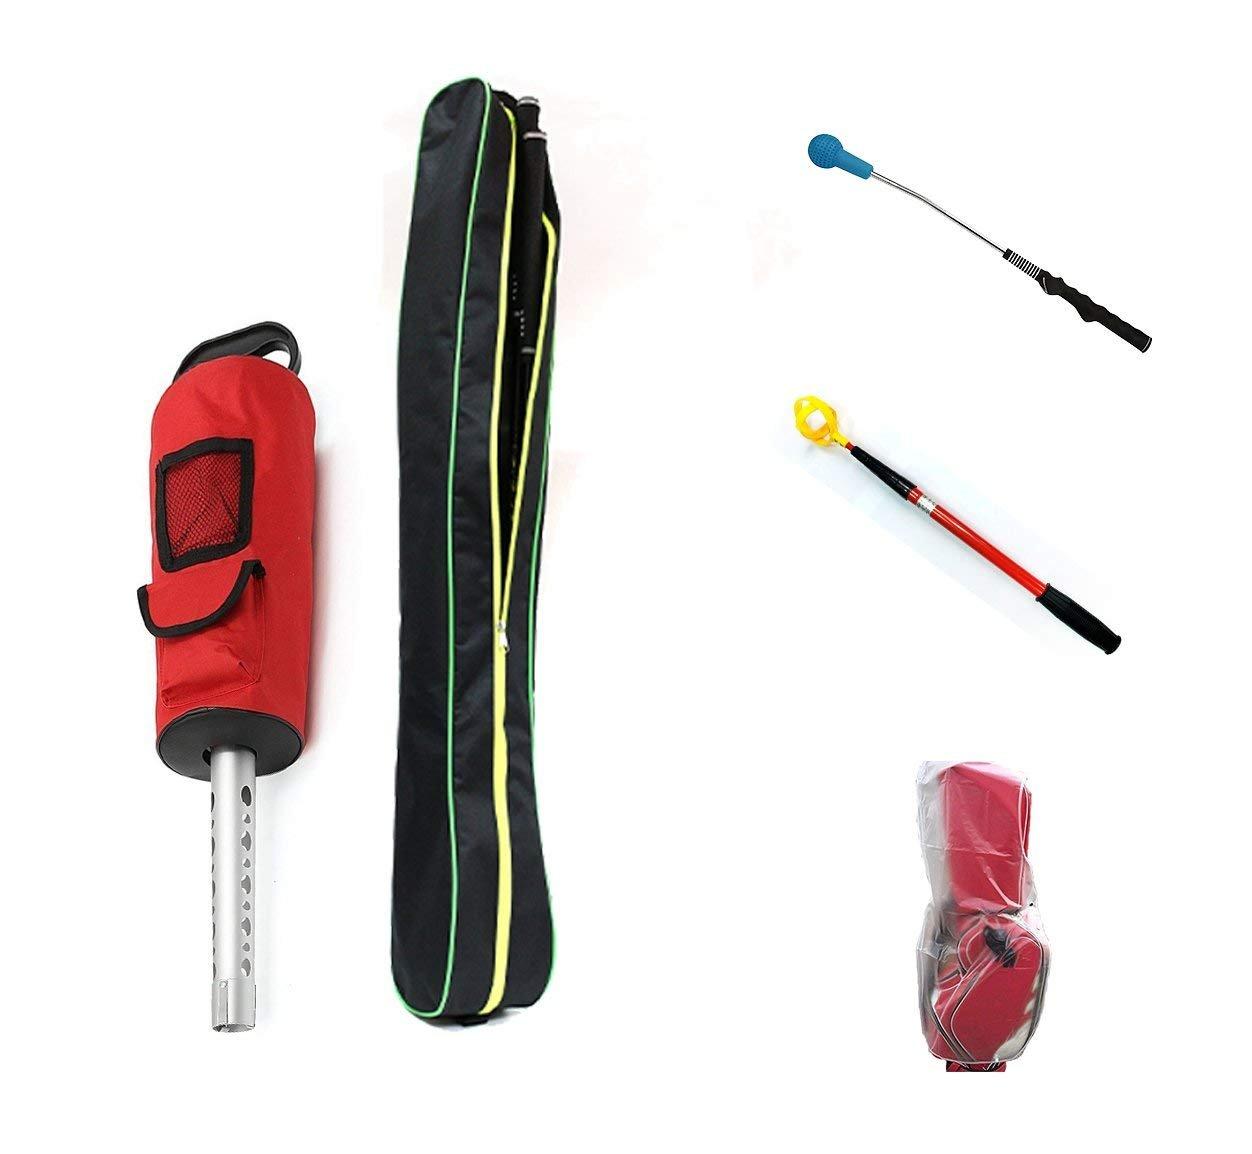 POSMA BR020CゴルフボールShagger伸縮ボールレトリーバーバンドルギフトセット付きゴルフボールピックアップ+ゴルフスイングトレーナー   B07FR1LCPM